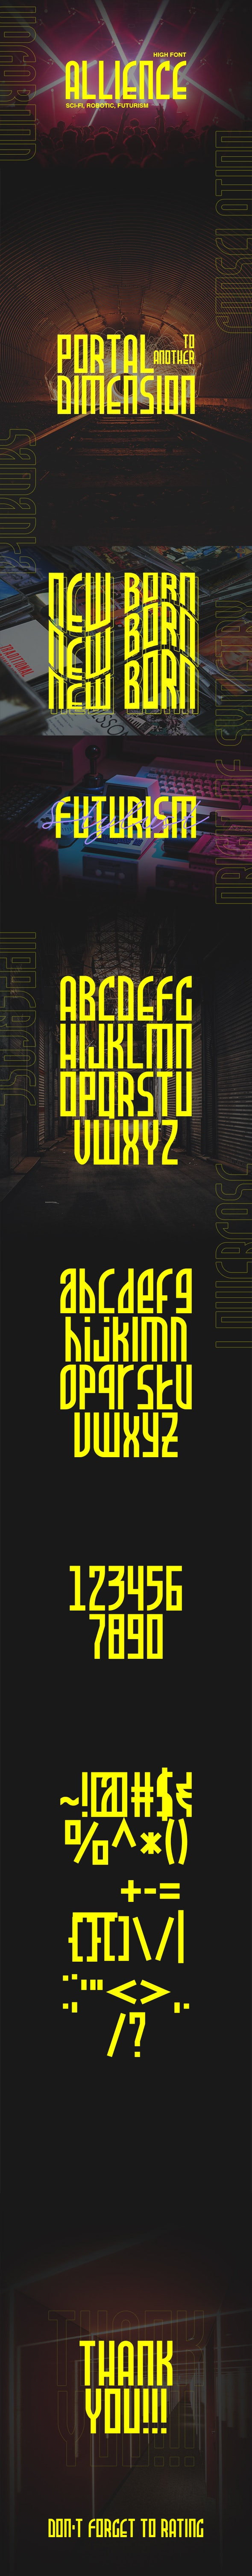 Allience - High Futurism Font - Condensed Sans-Serif